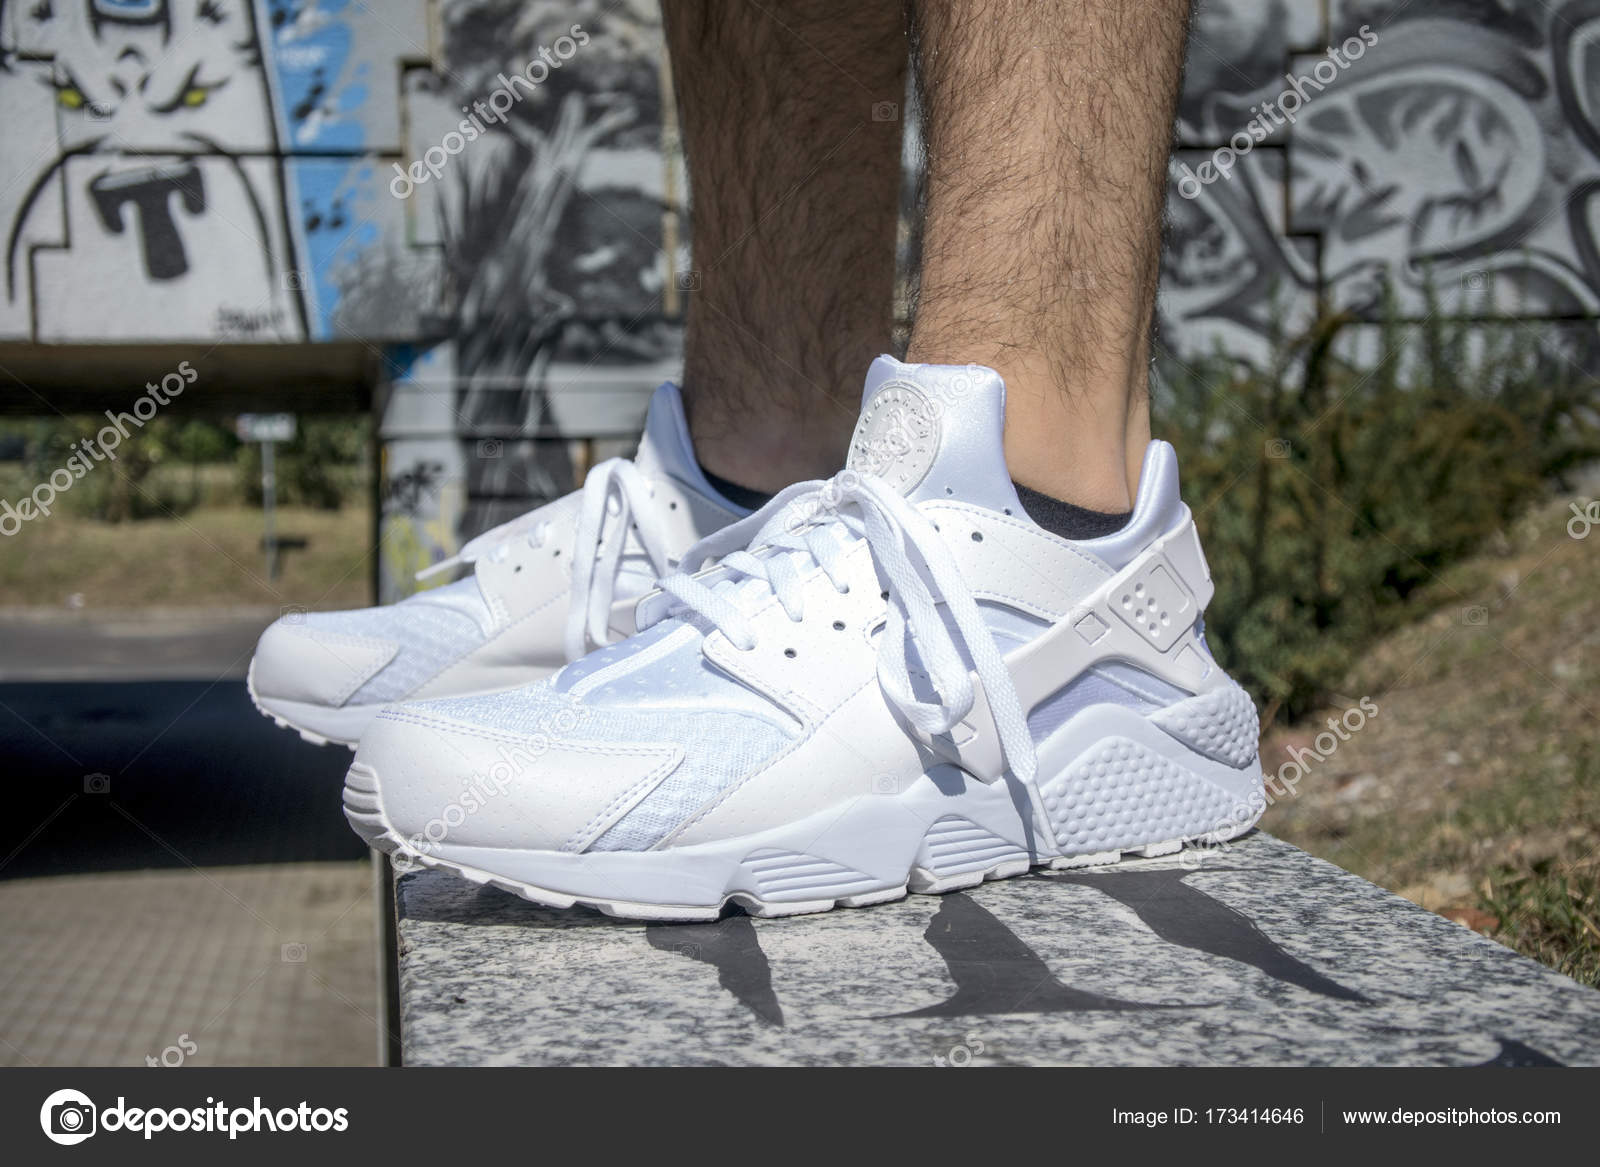 Italien Schuhe Nike Auf 2017 Juli Der Mailand Huarache qUMpSzV